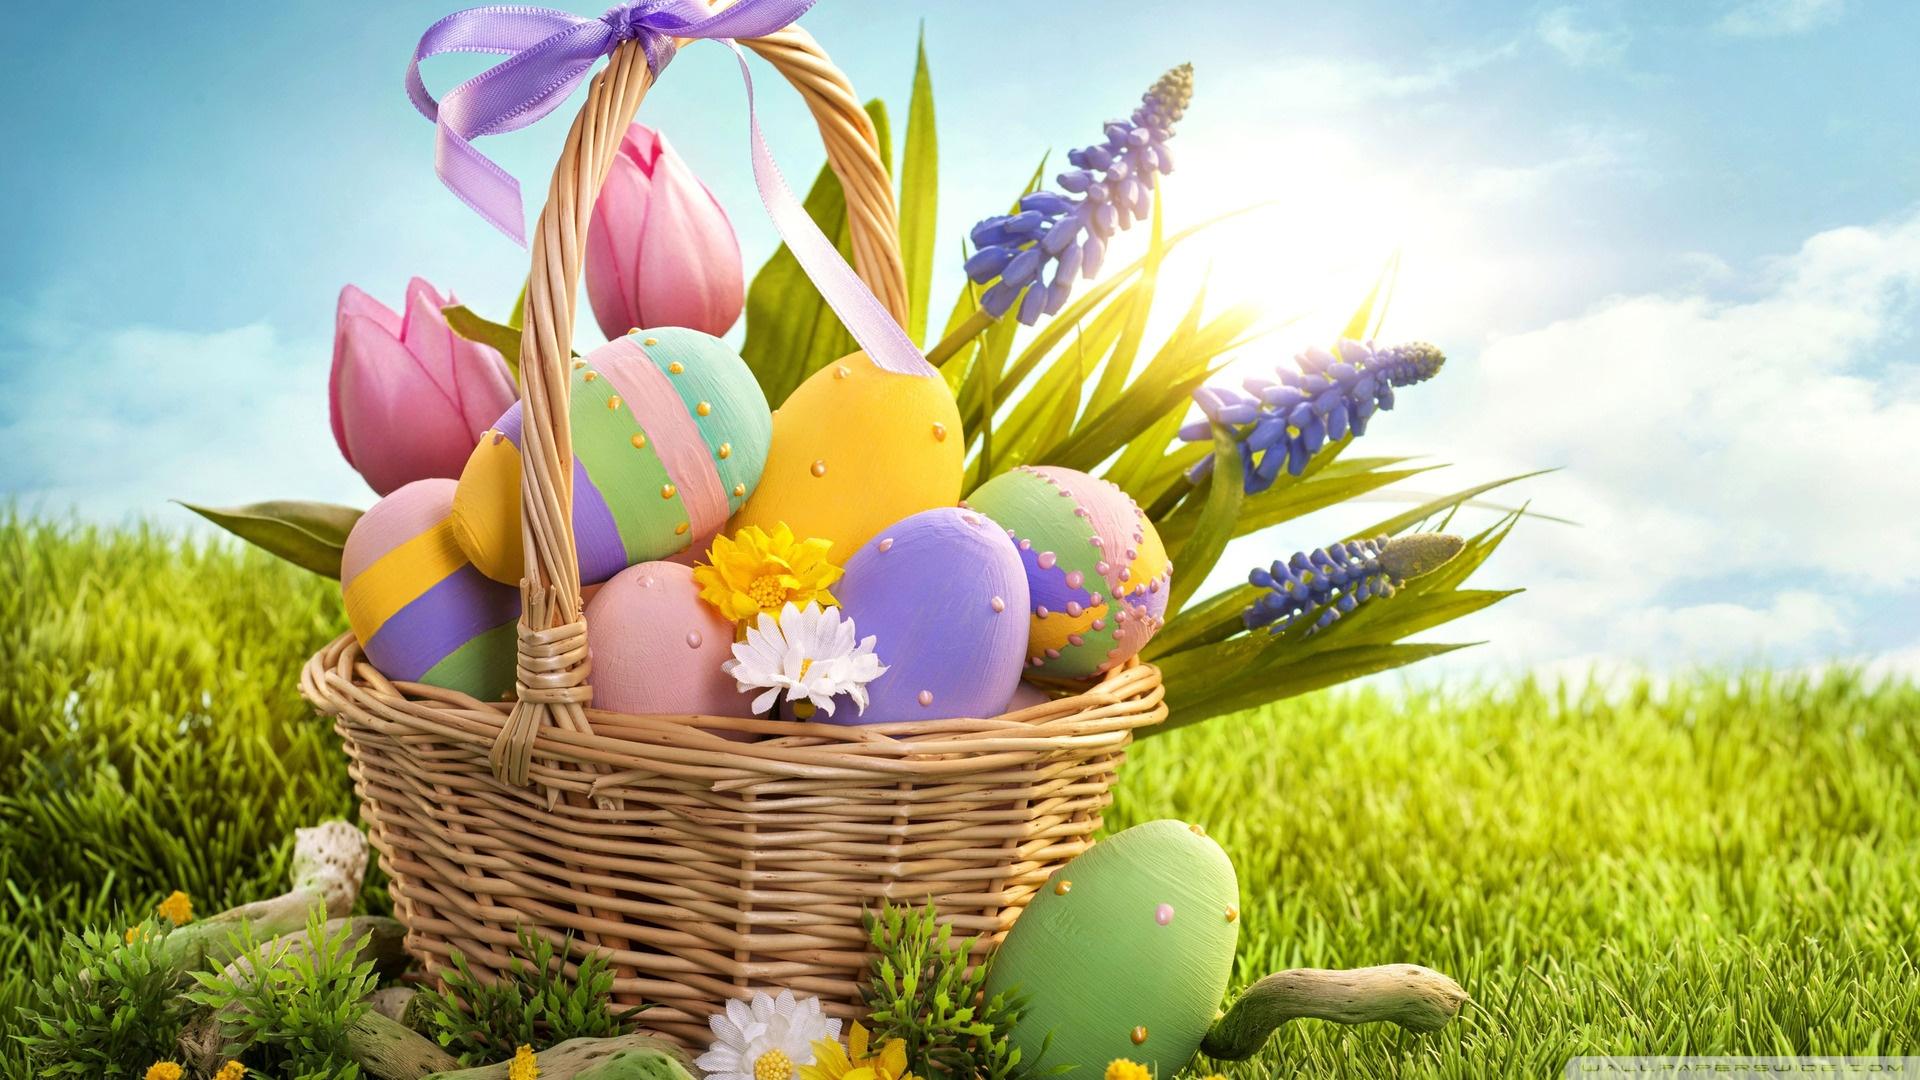 Happy Easter jessi94 Sis   jessi94 Wallpaper 38258567 1920x1080